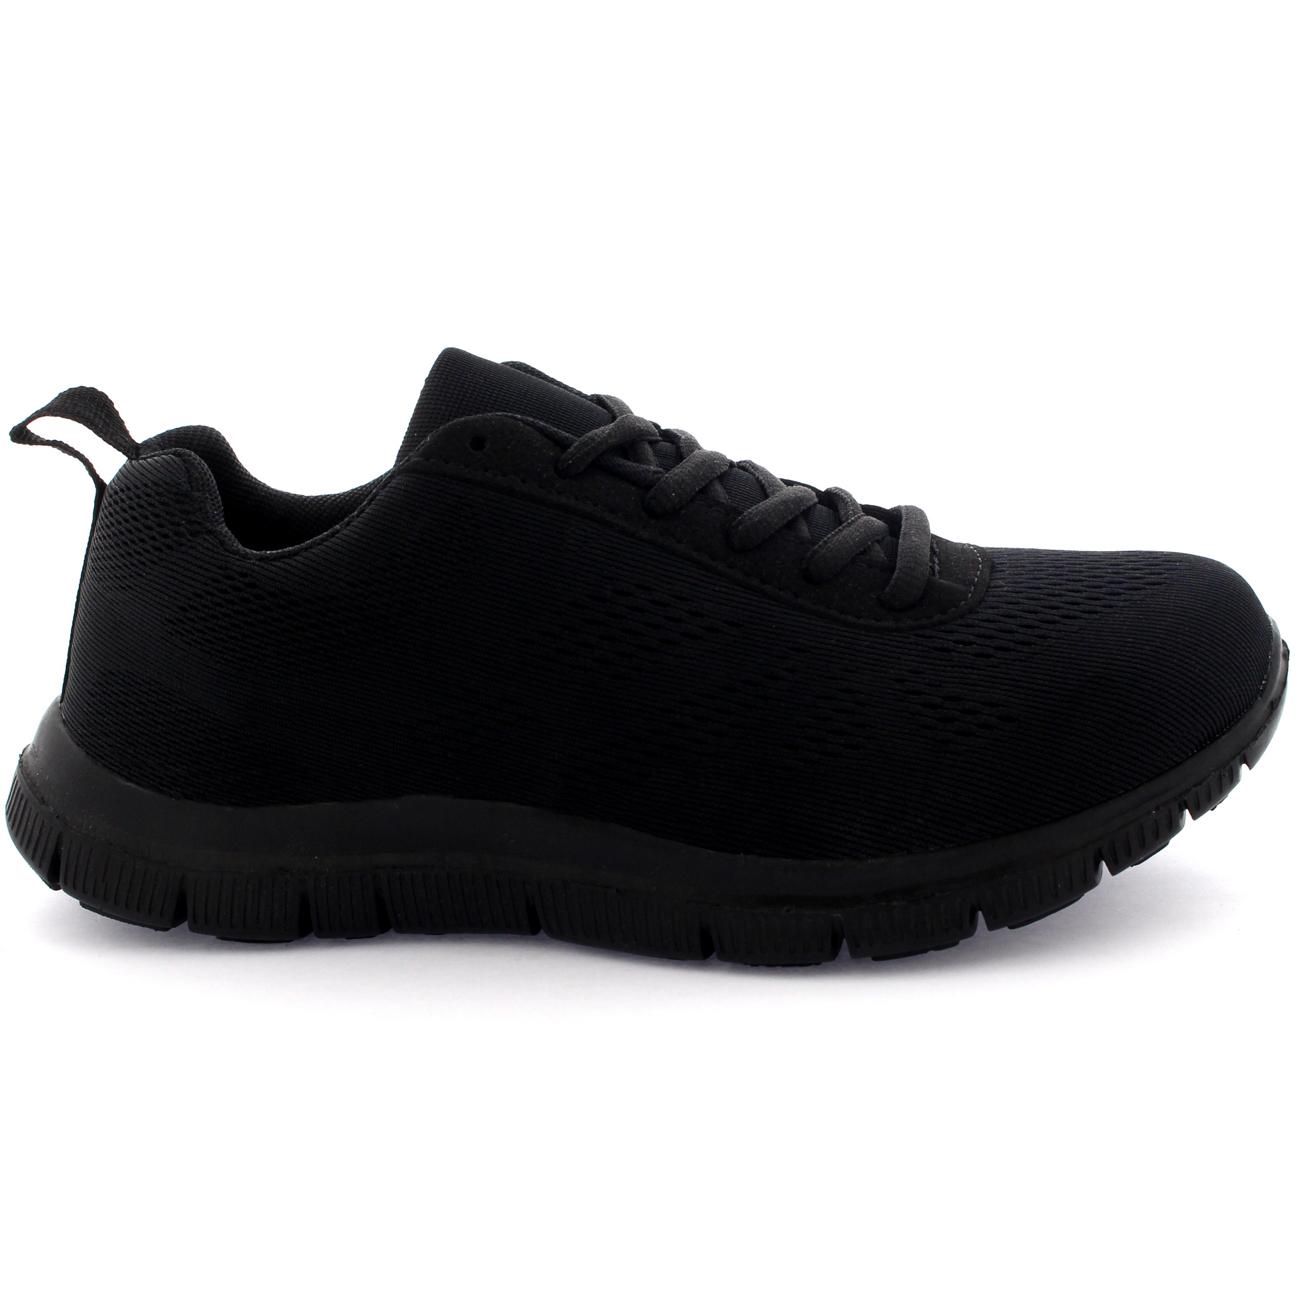 Ladies Get Fit Mesh Running Trainers Athletic Walk Gym Shoes Sport Run UK 3-9